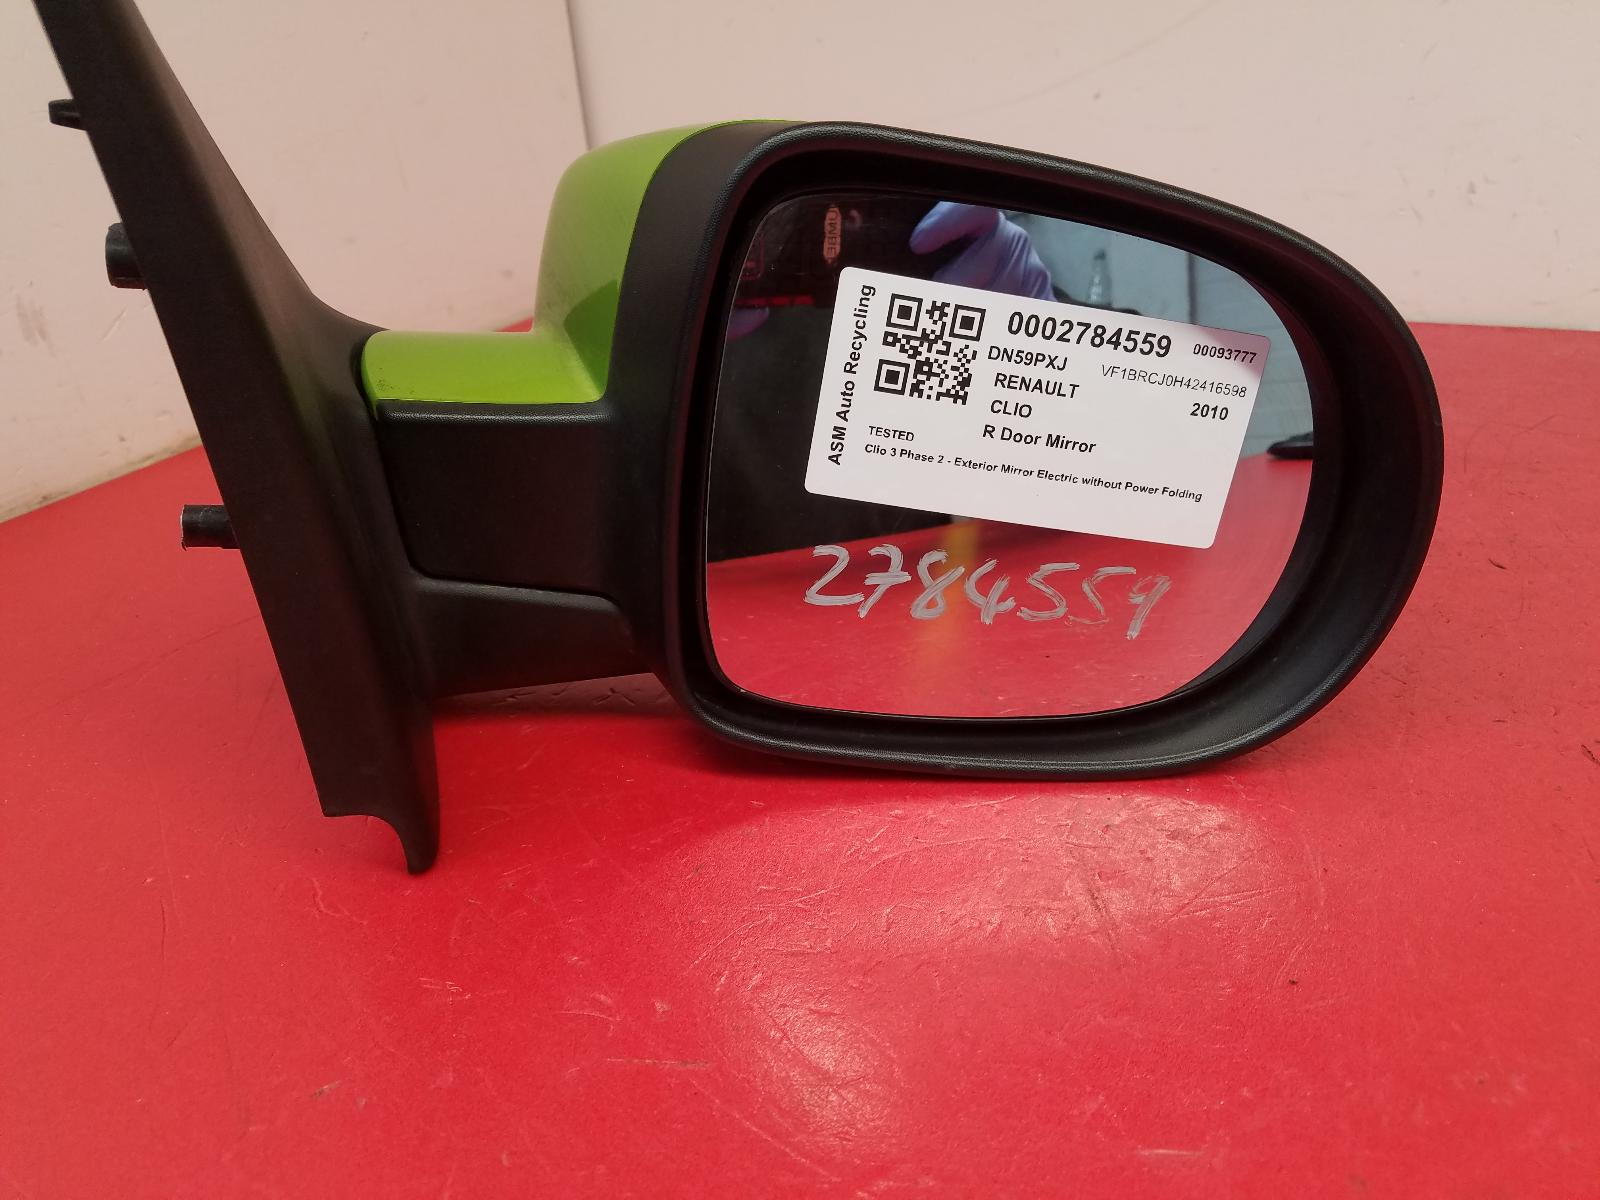 View Auto part R Door Mirror Renault Clio 2010